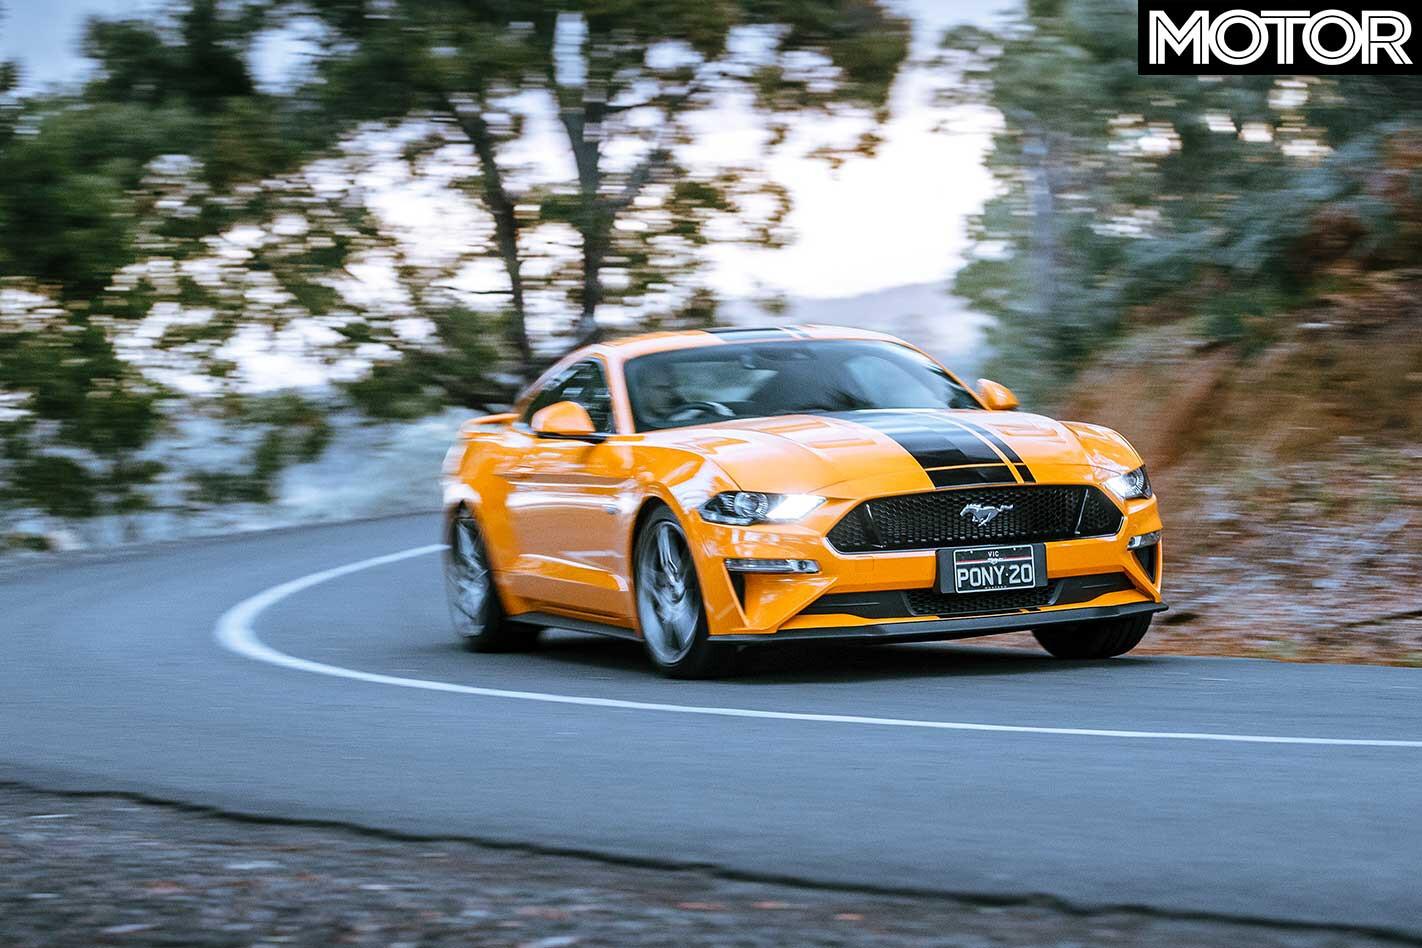 2018 Ford Mustang GT Fast Sweeping Bend Jpg